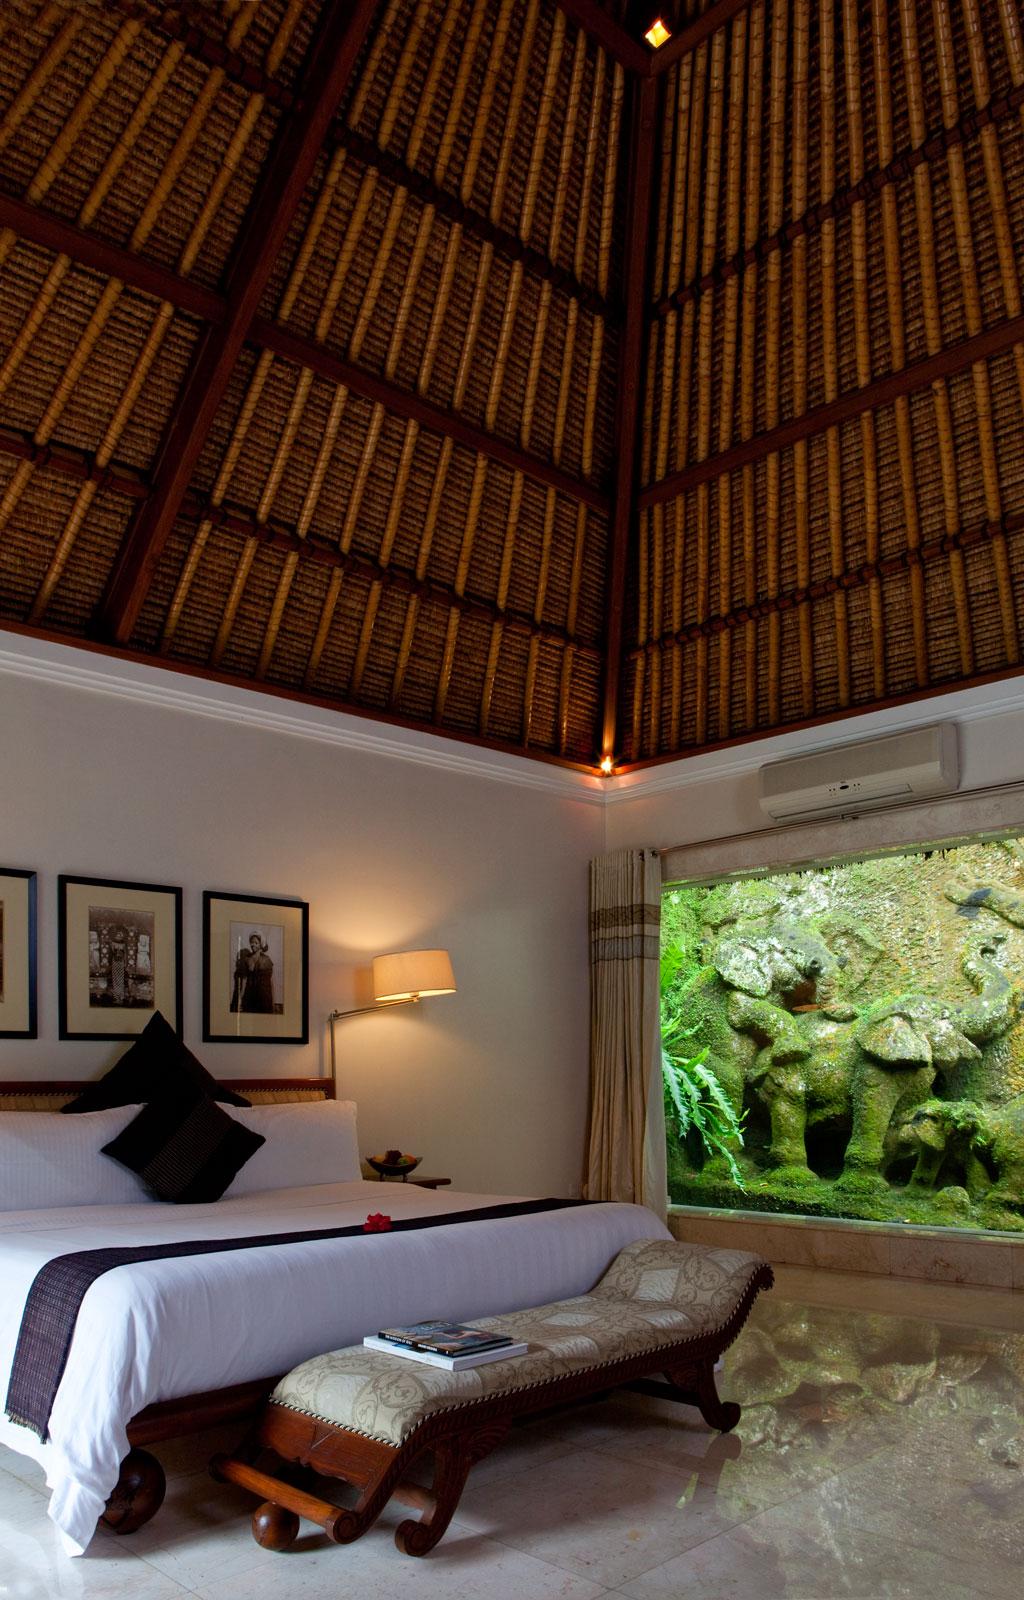 Viceroy Bali, a 5-Star Resort and Spa (13)